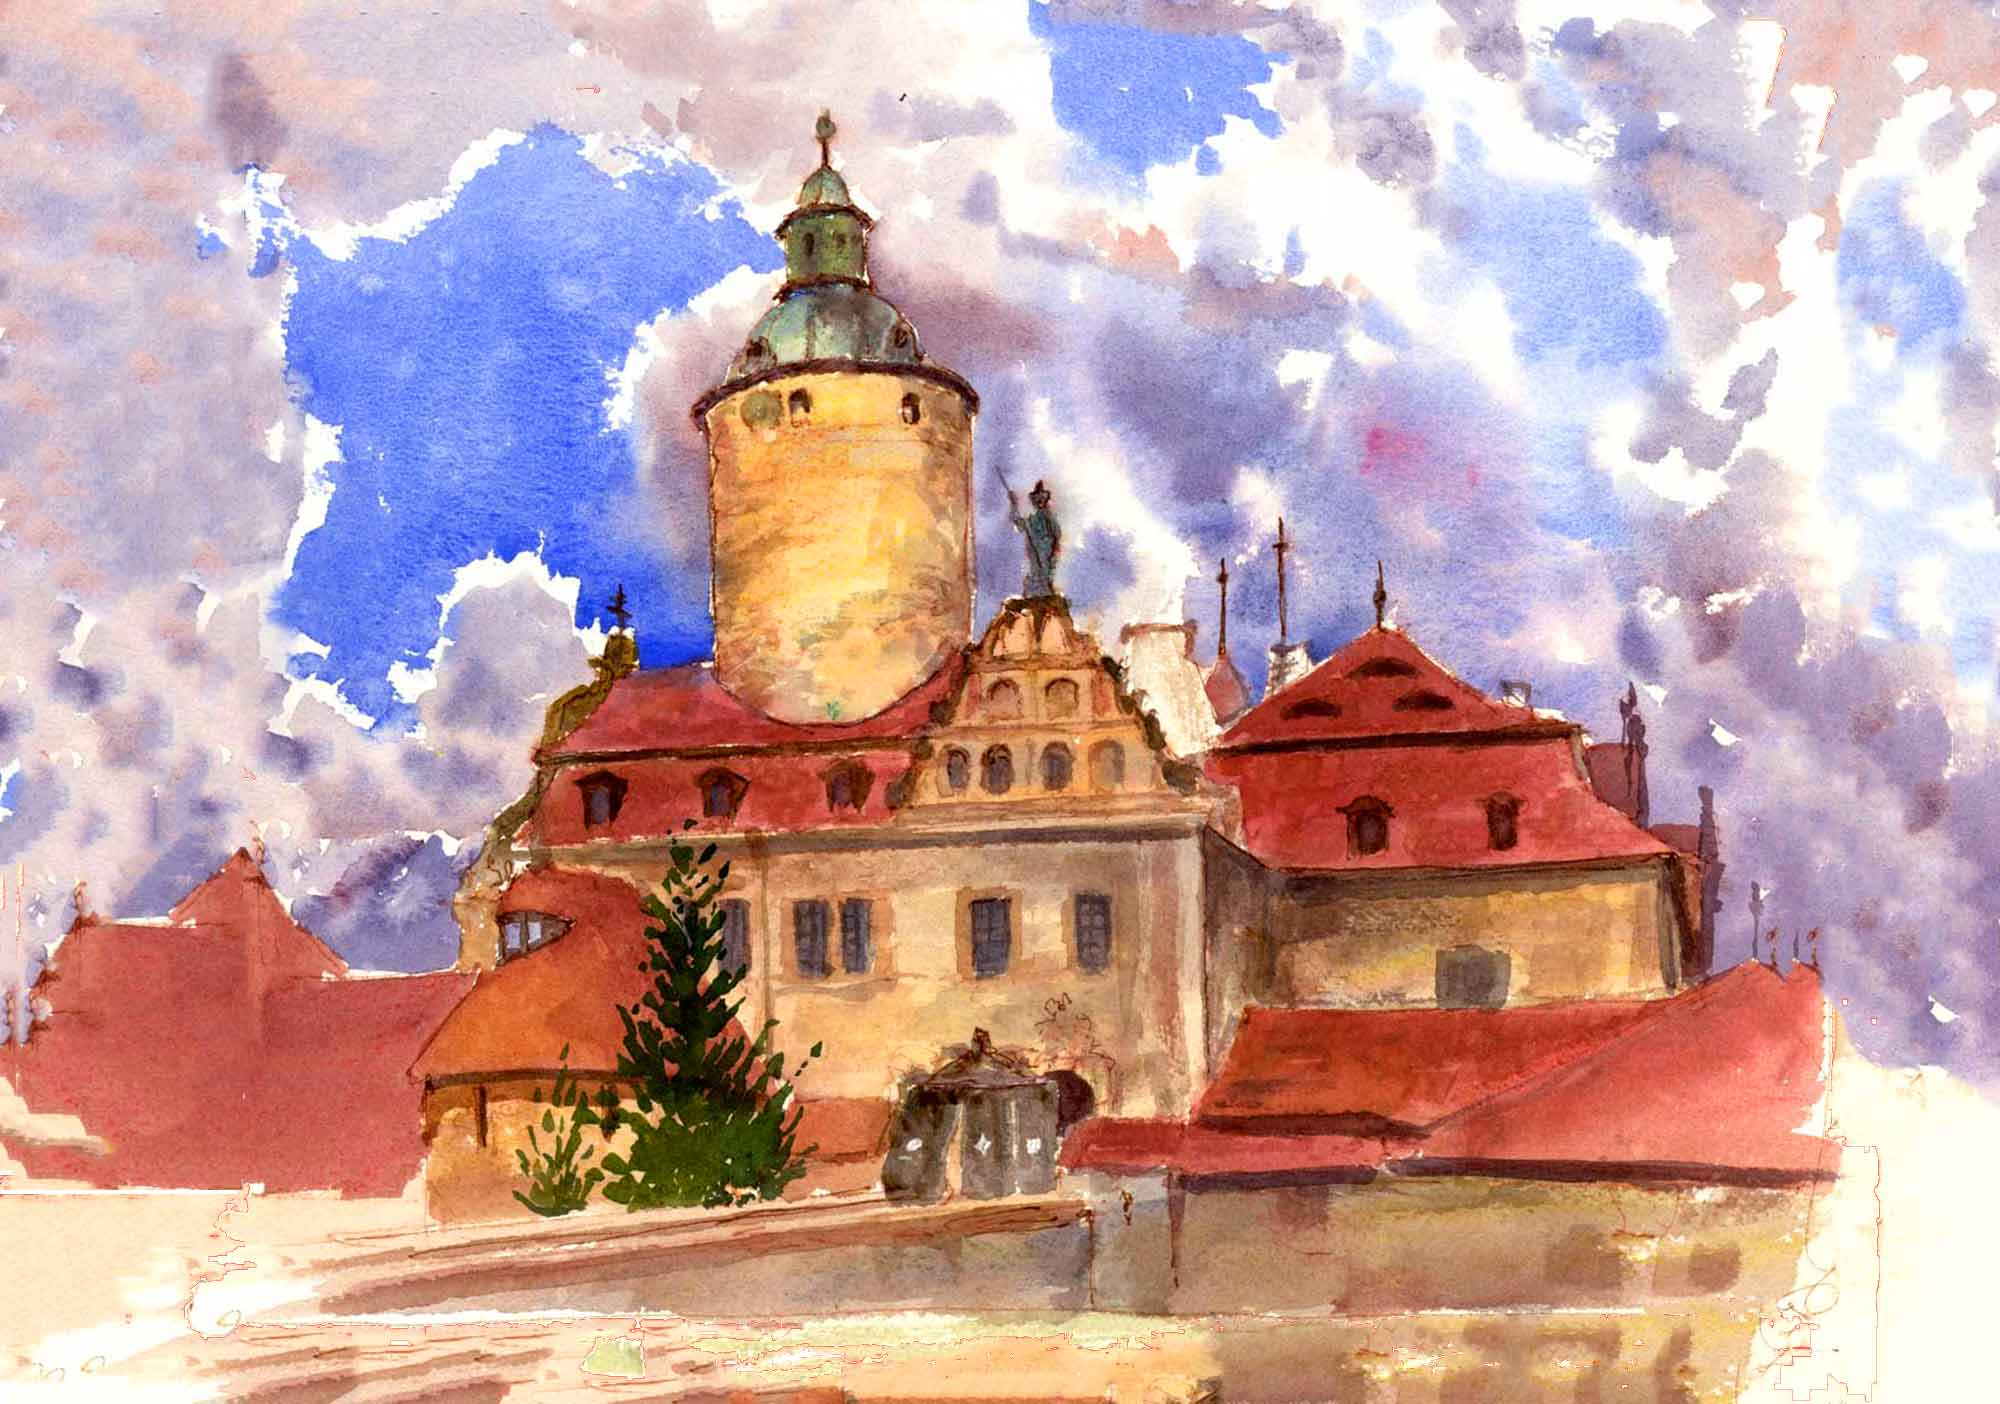 Castle Czocha painted in watercolors